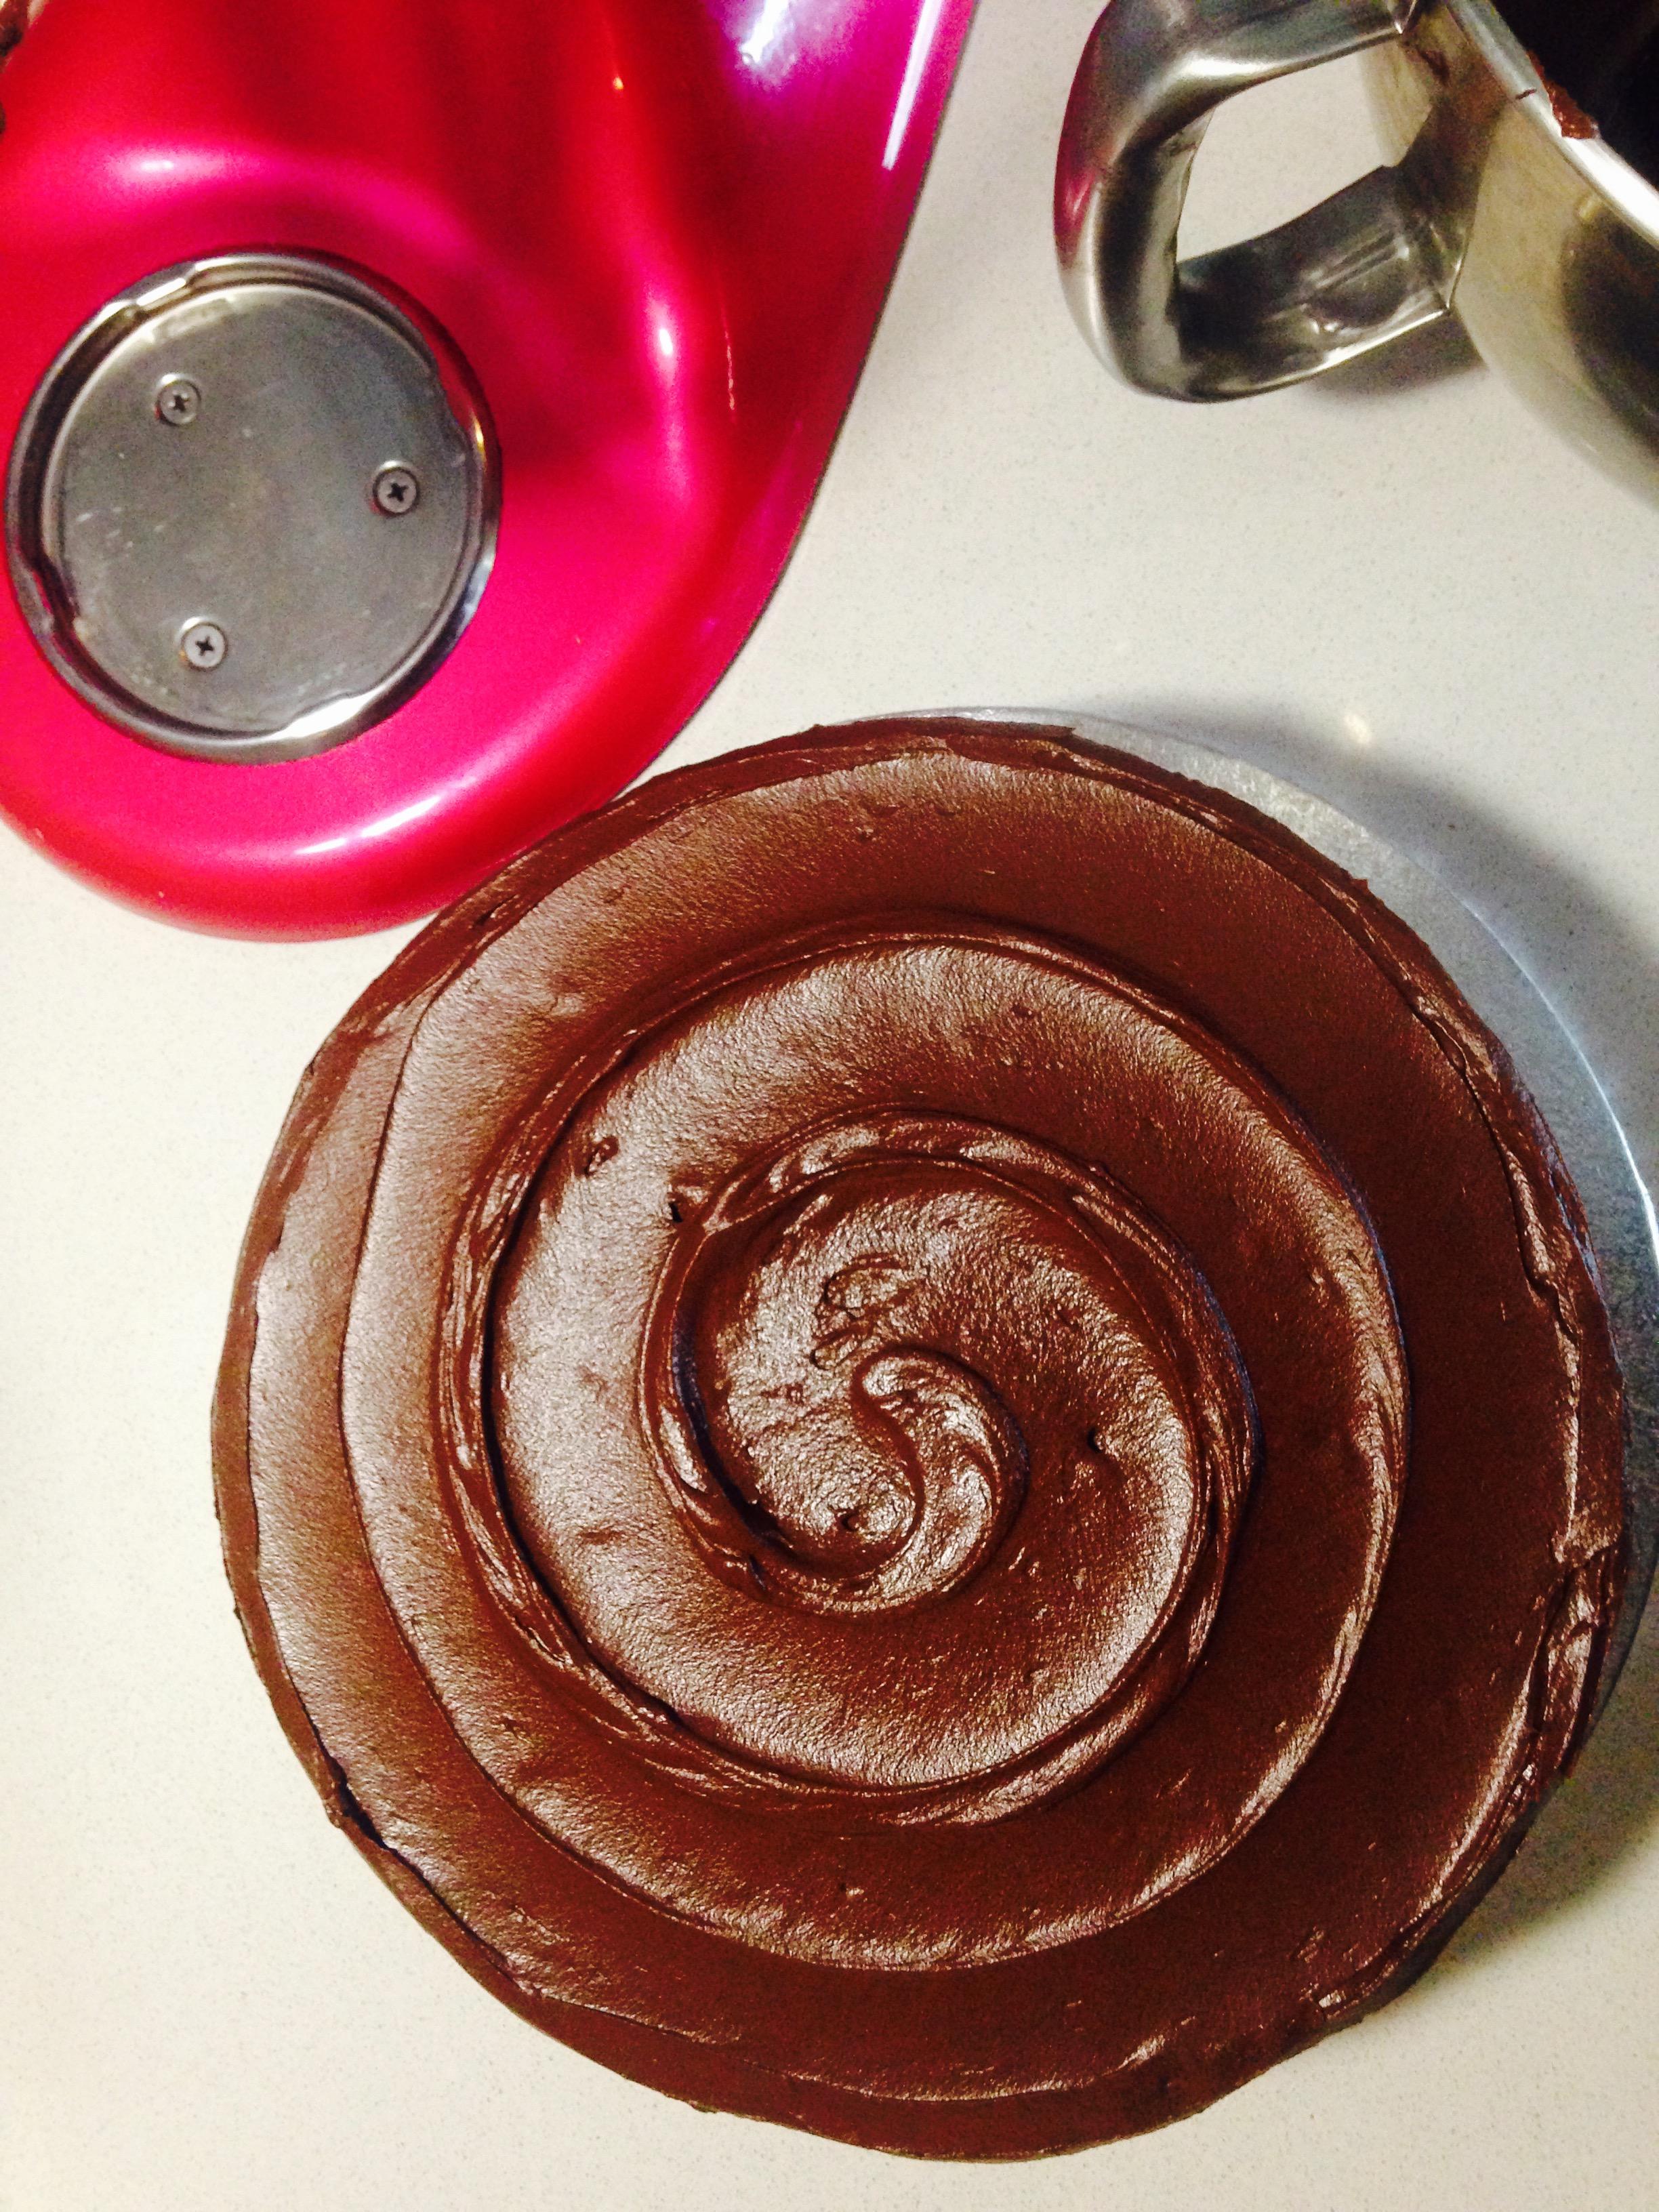 Chocolate Swirl Topped Cake